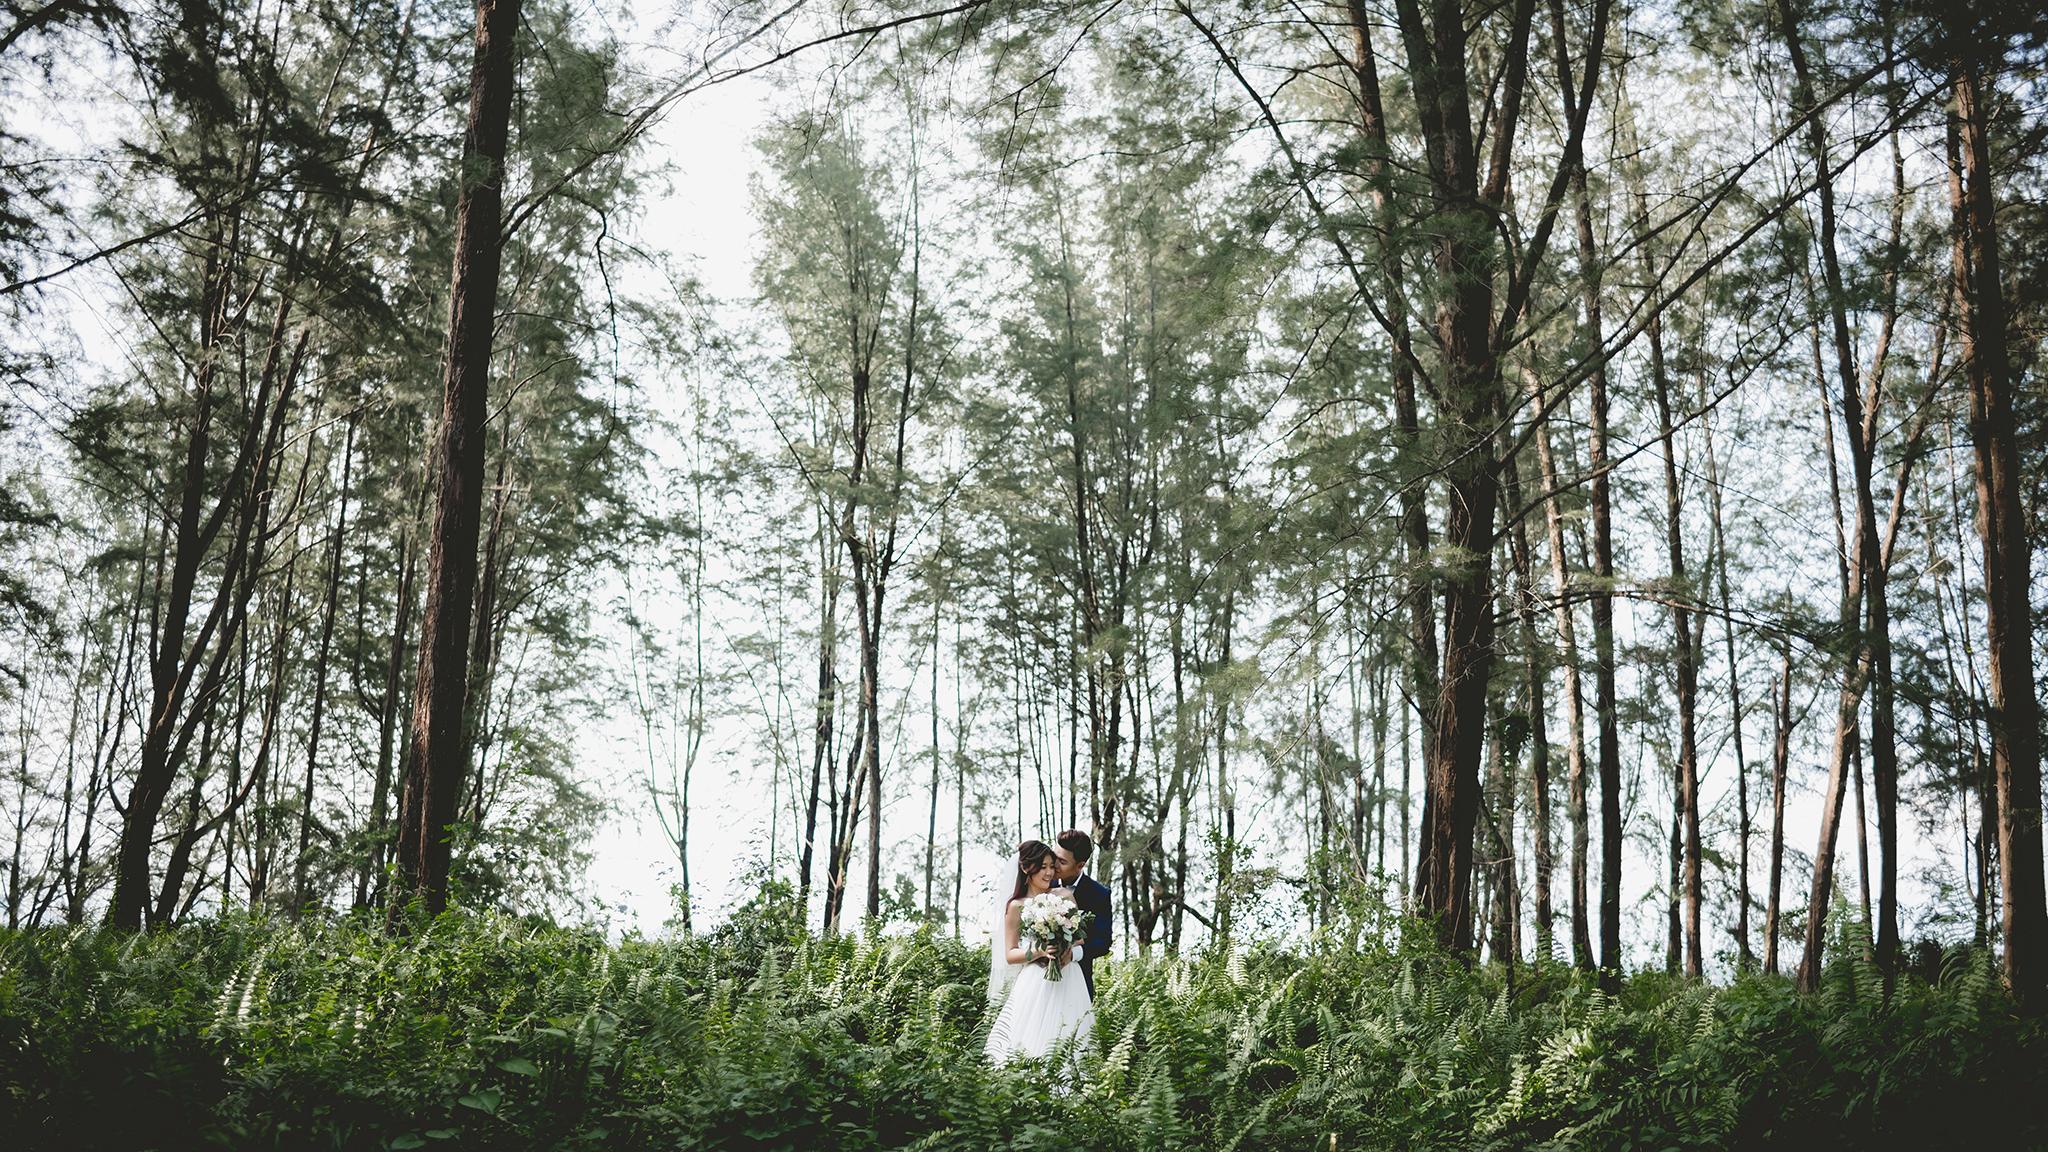 Pre wedding cony island 021.JPG